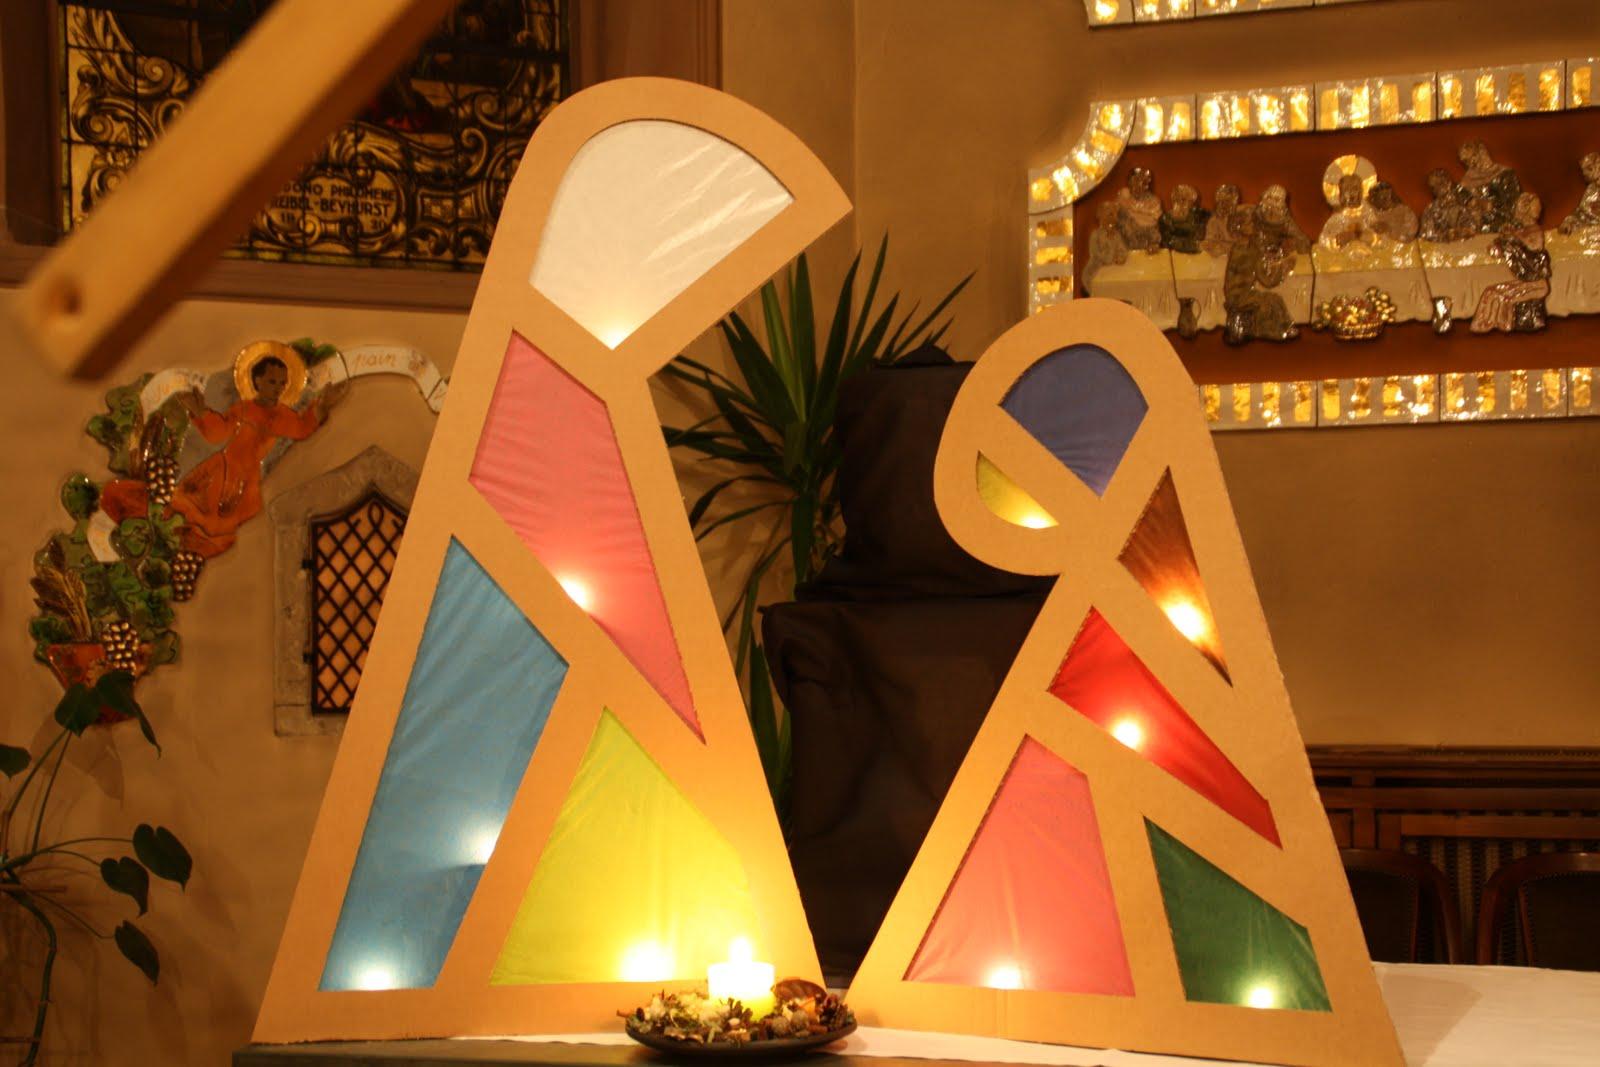 Decoration De Noel Lumineuse Joyeuse Fetes Retif